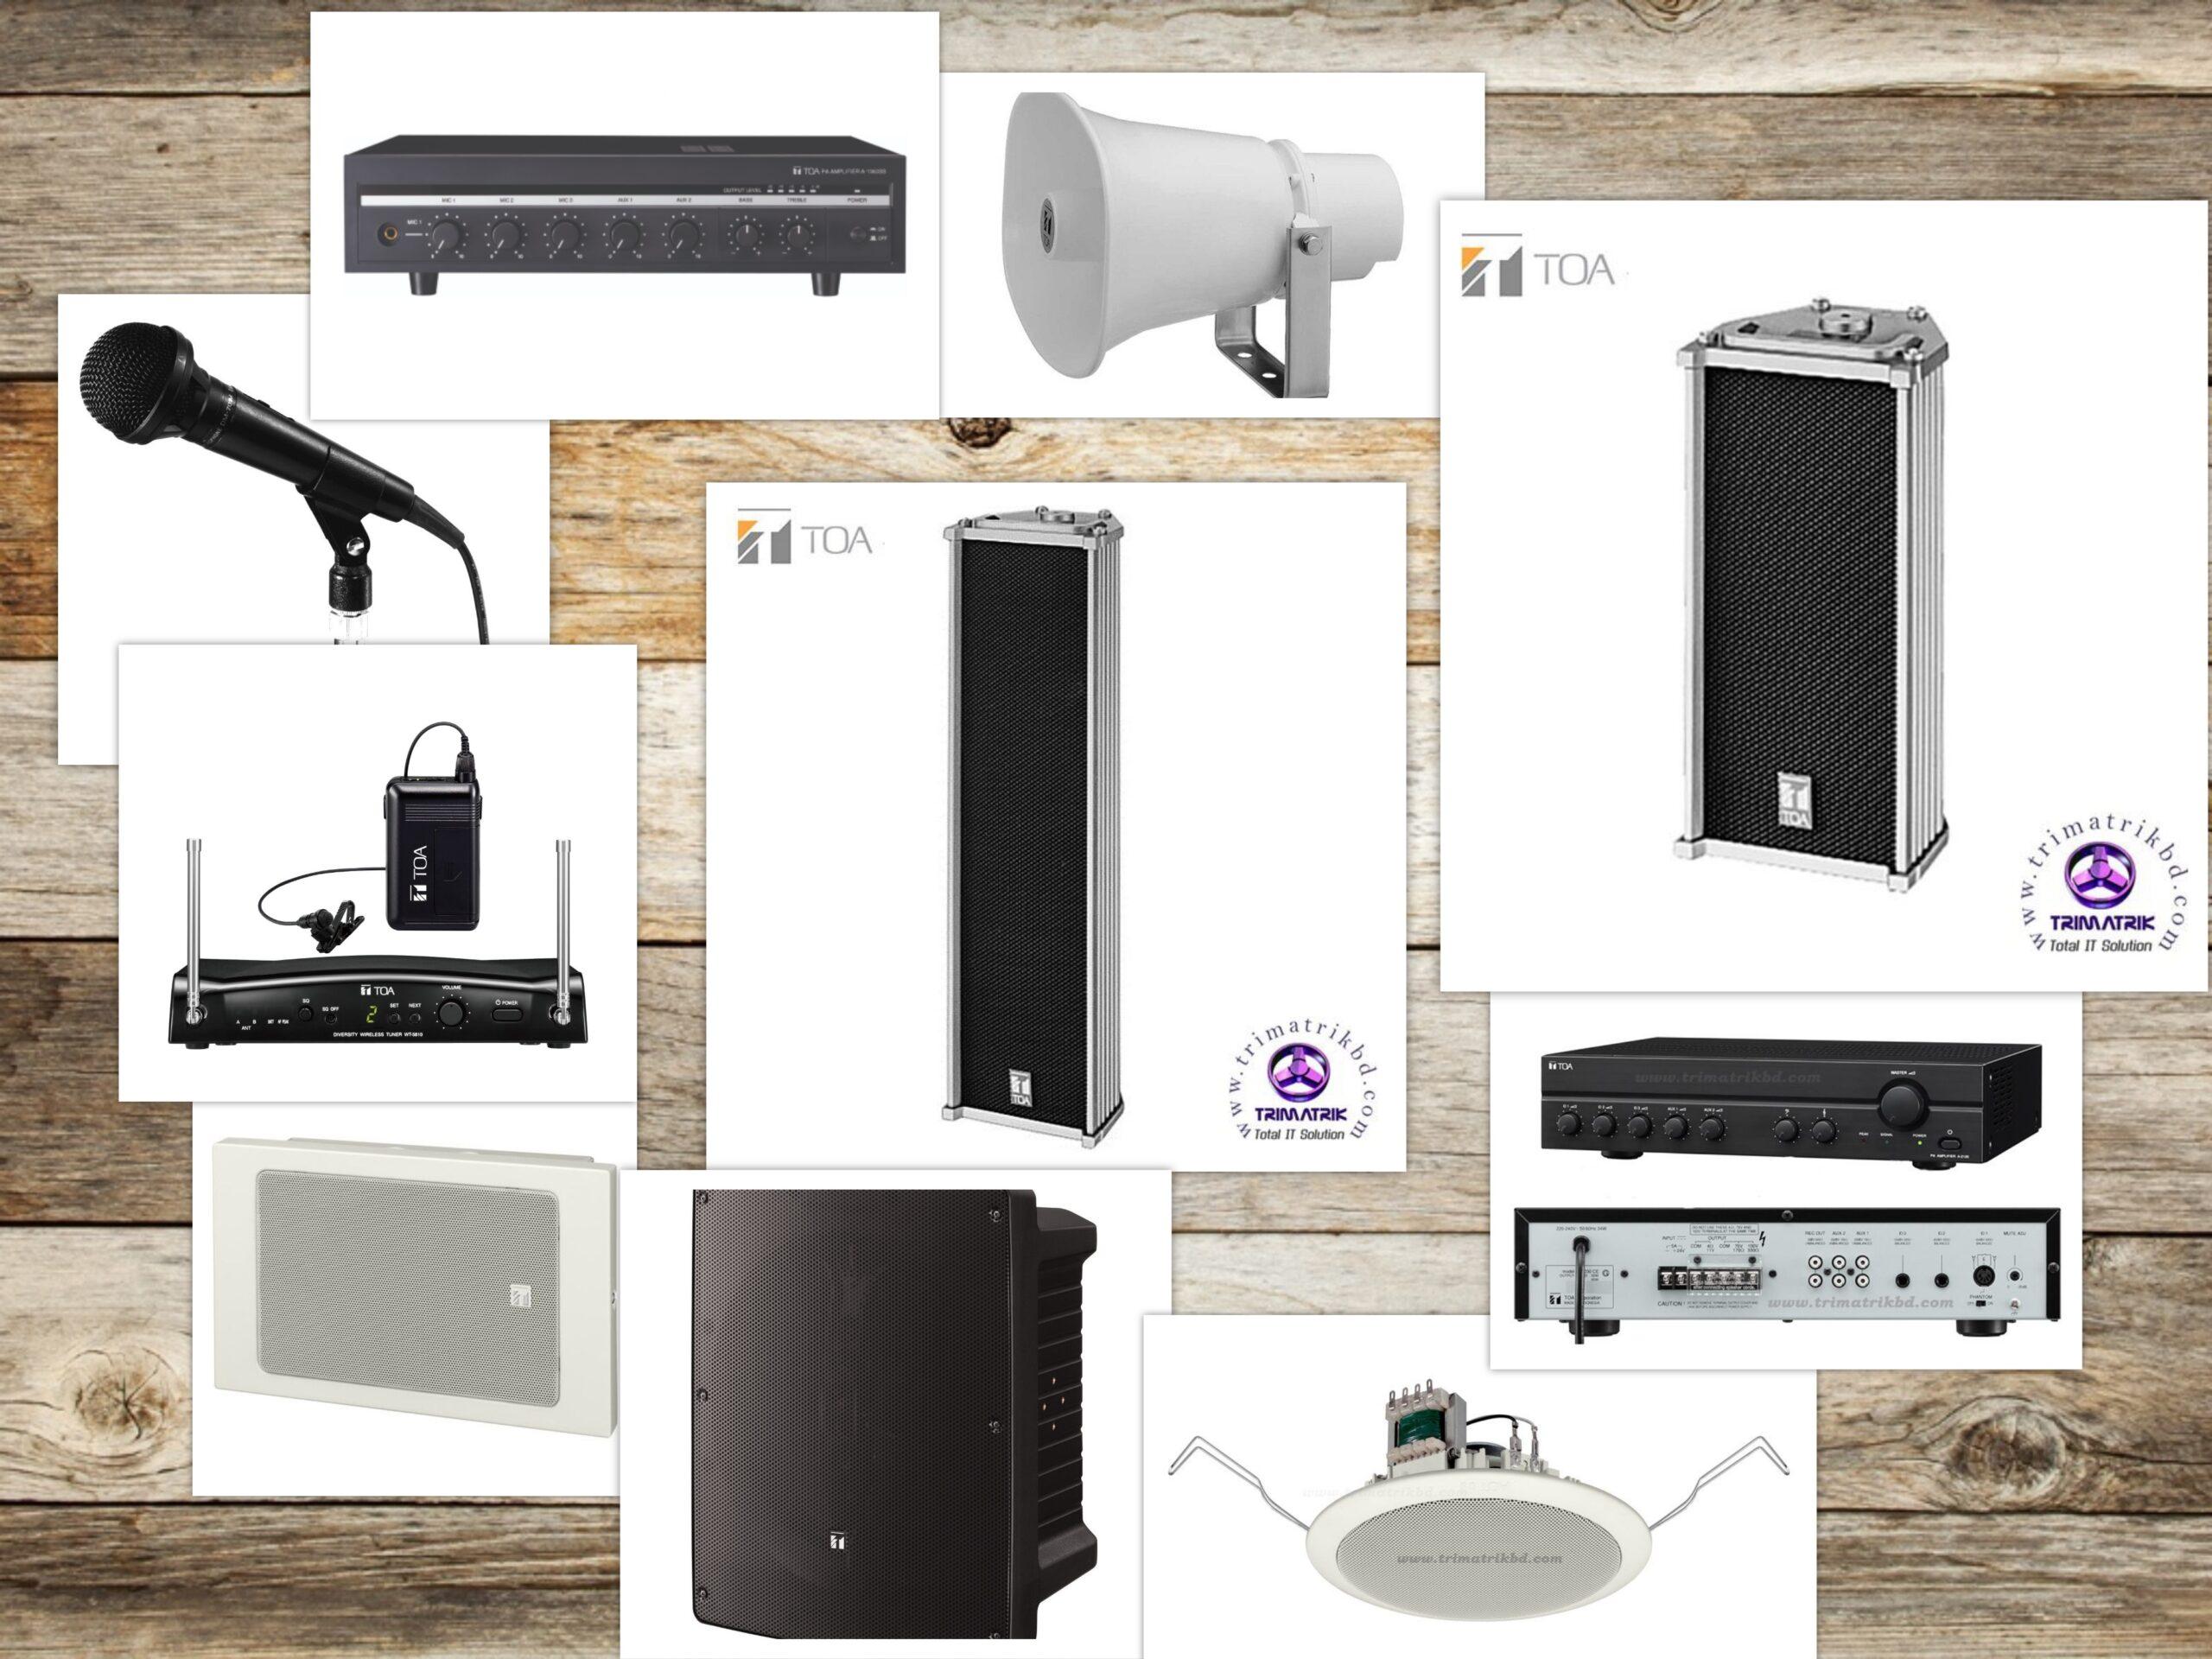 toa bd scaled, Toa sound system Bangladesh